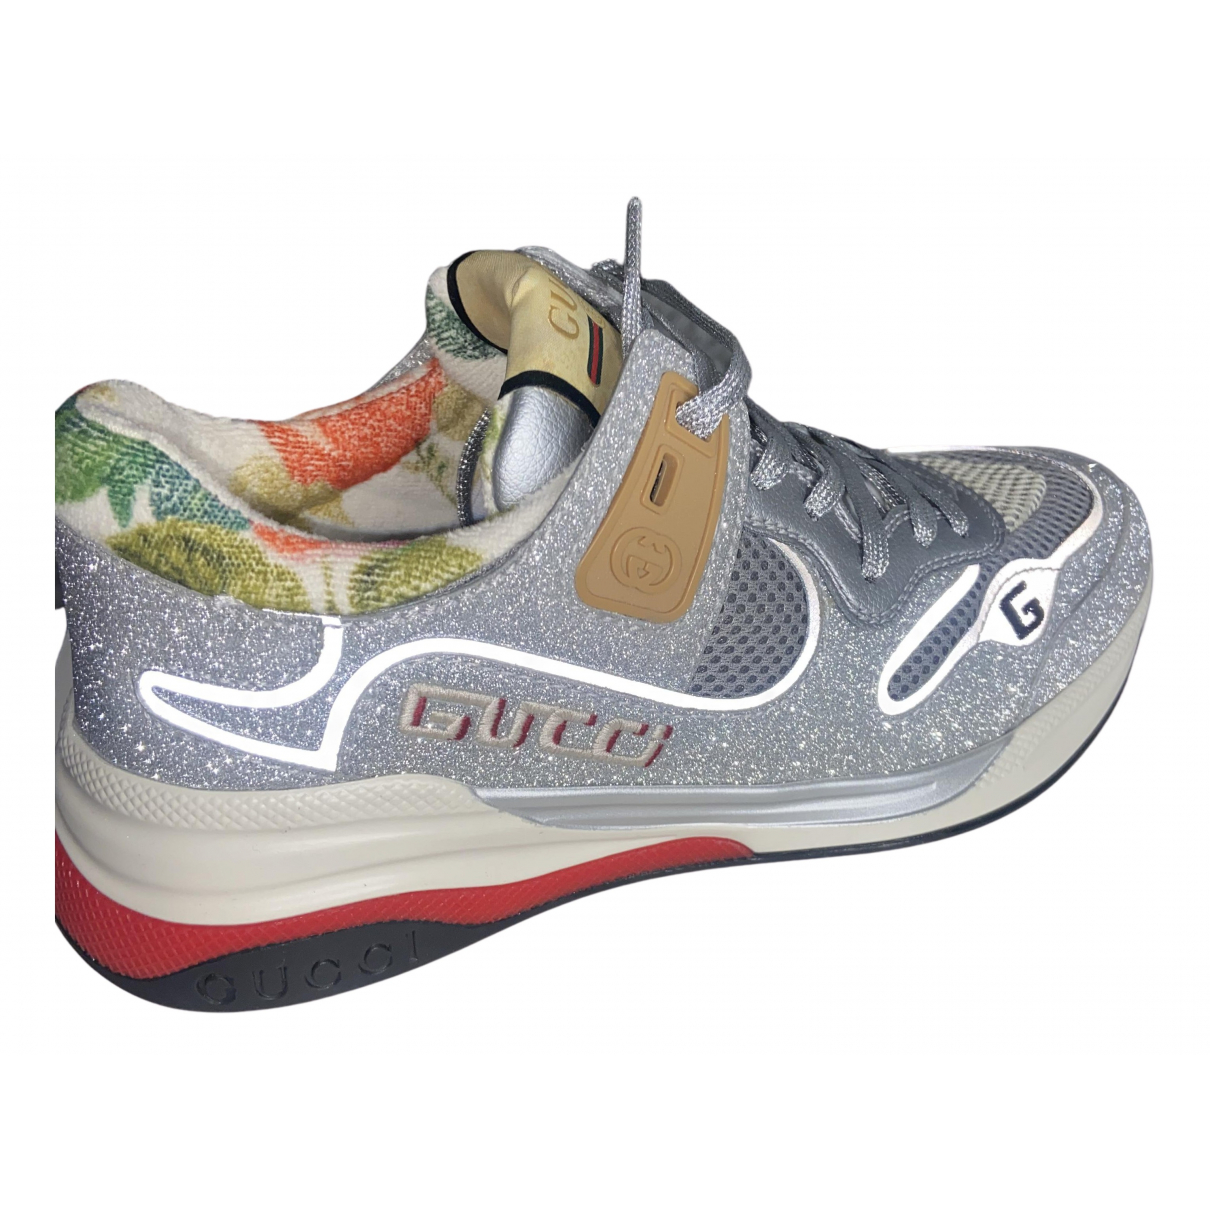 Gucci Ultrapace Sneakers in  Grau Mit Pailletten